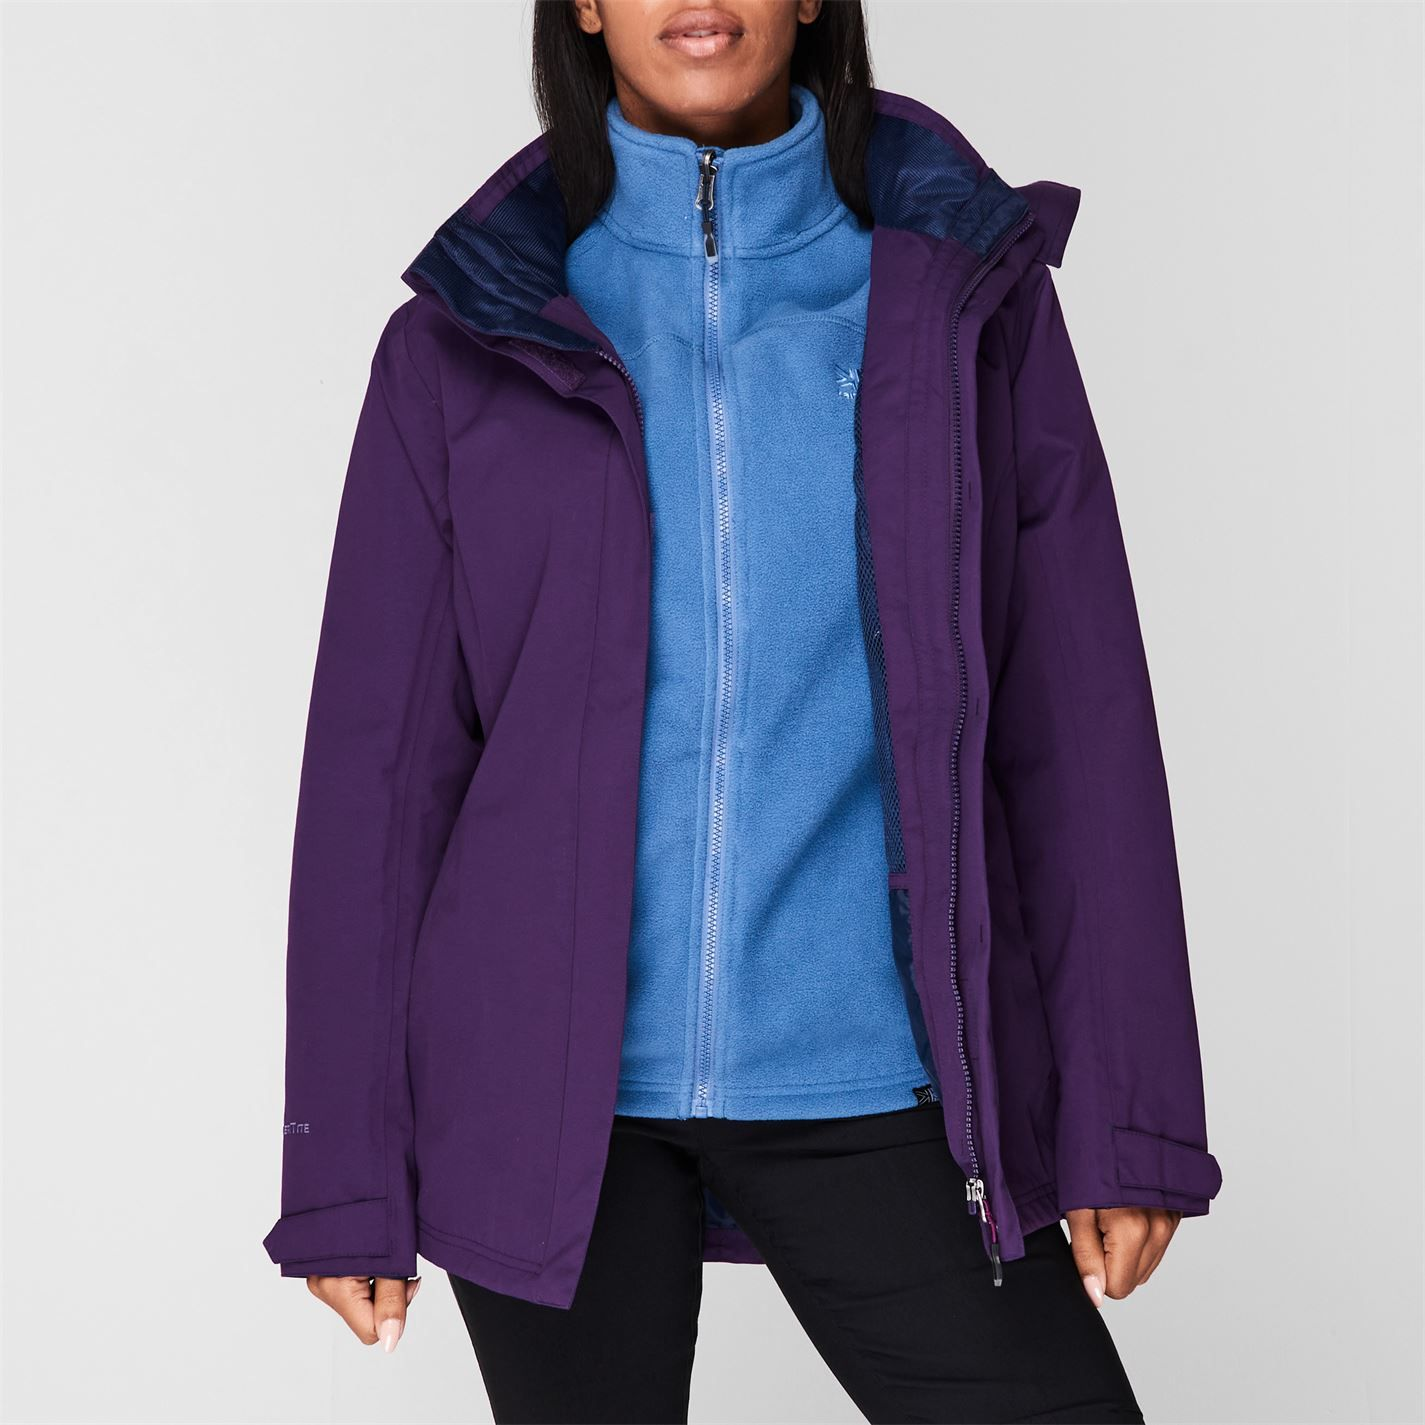 Karrimor Womens 3in1 Jacket Coat Top Ladies Hooded Fleece Mesh Lining Warm Sport